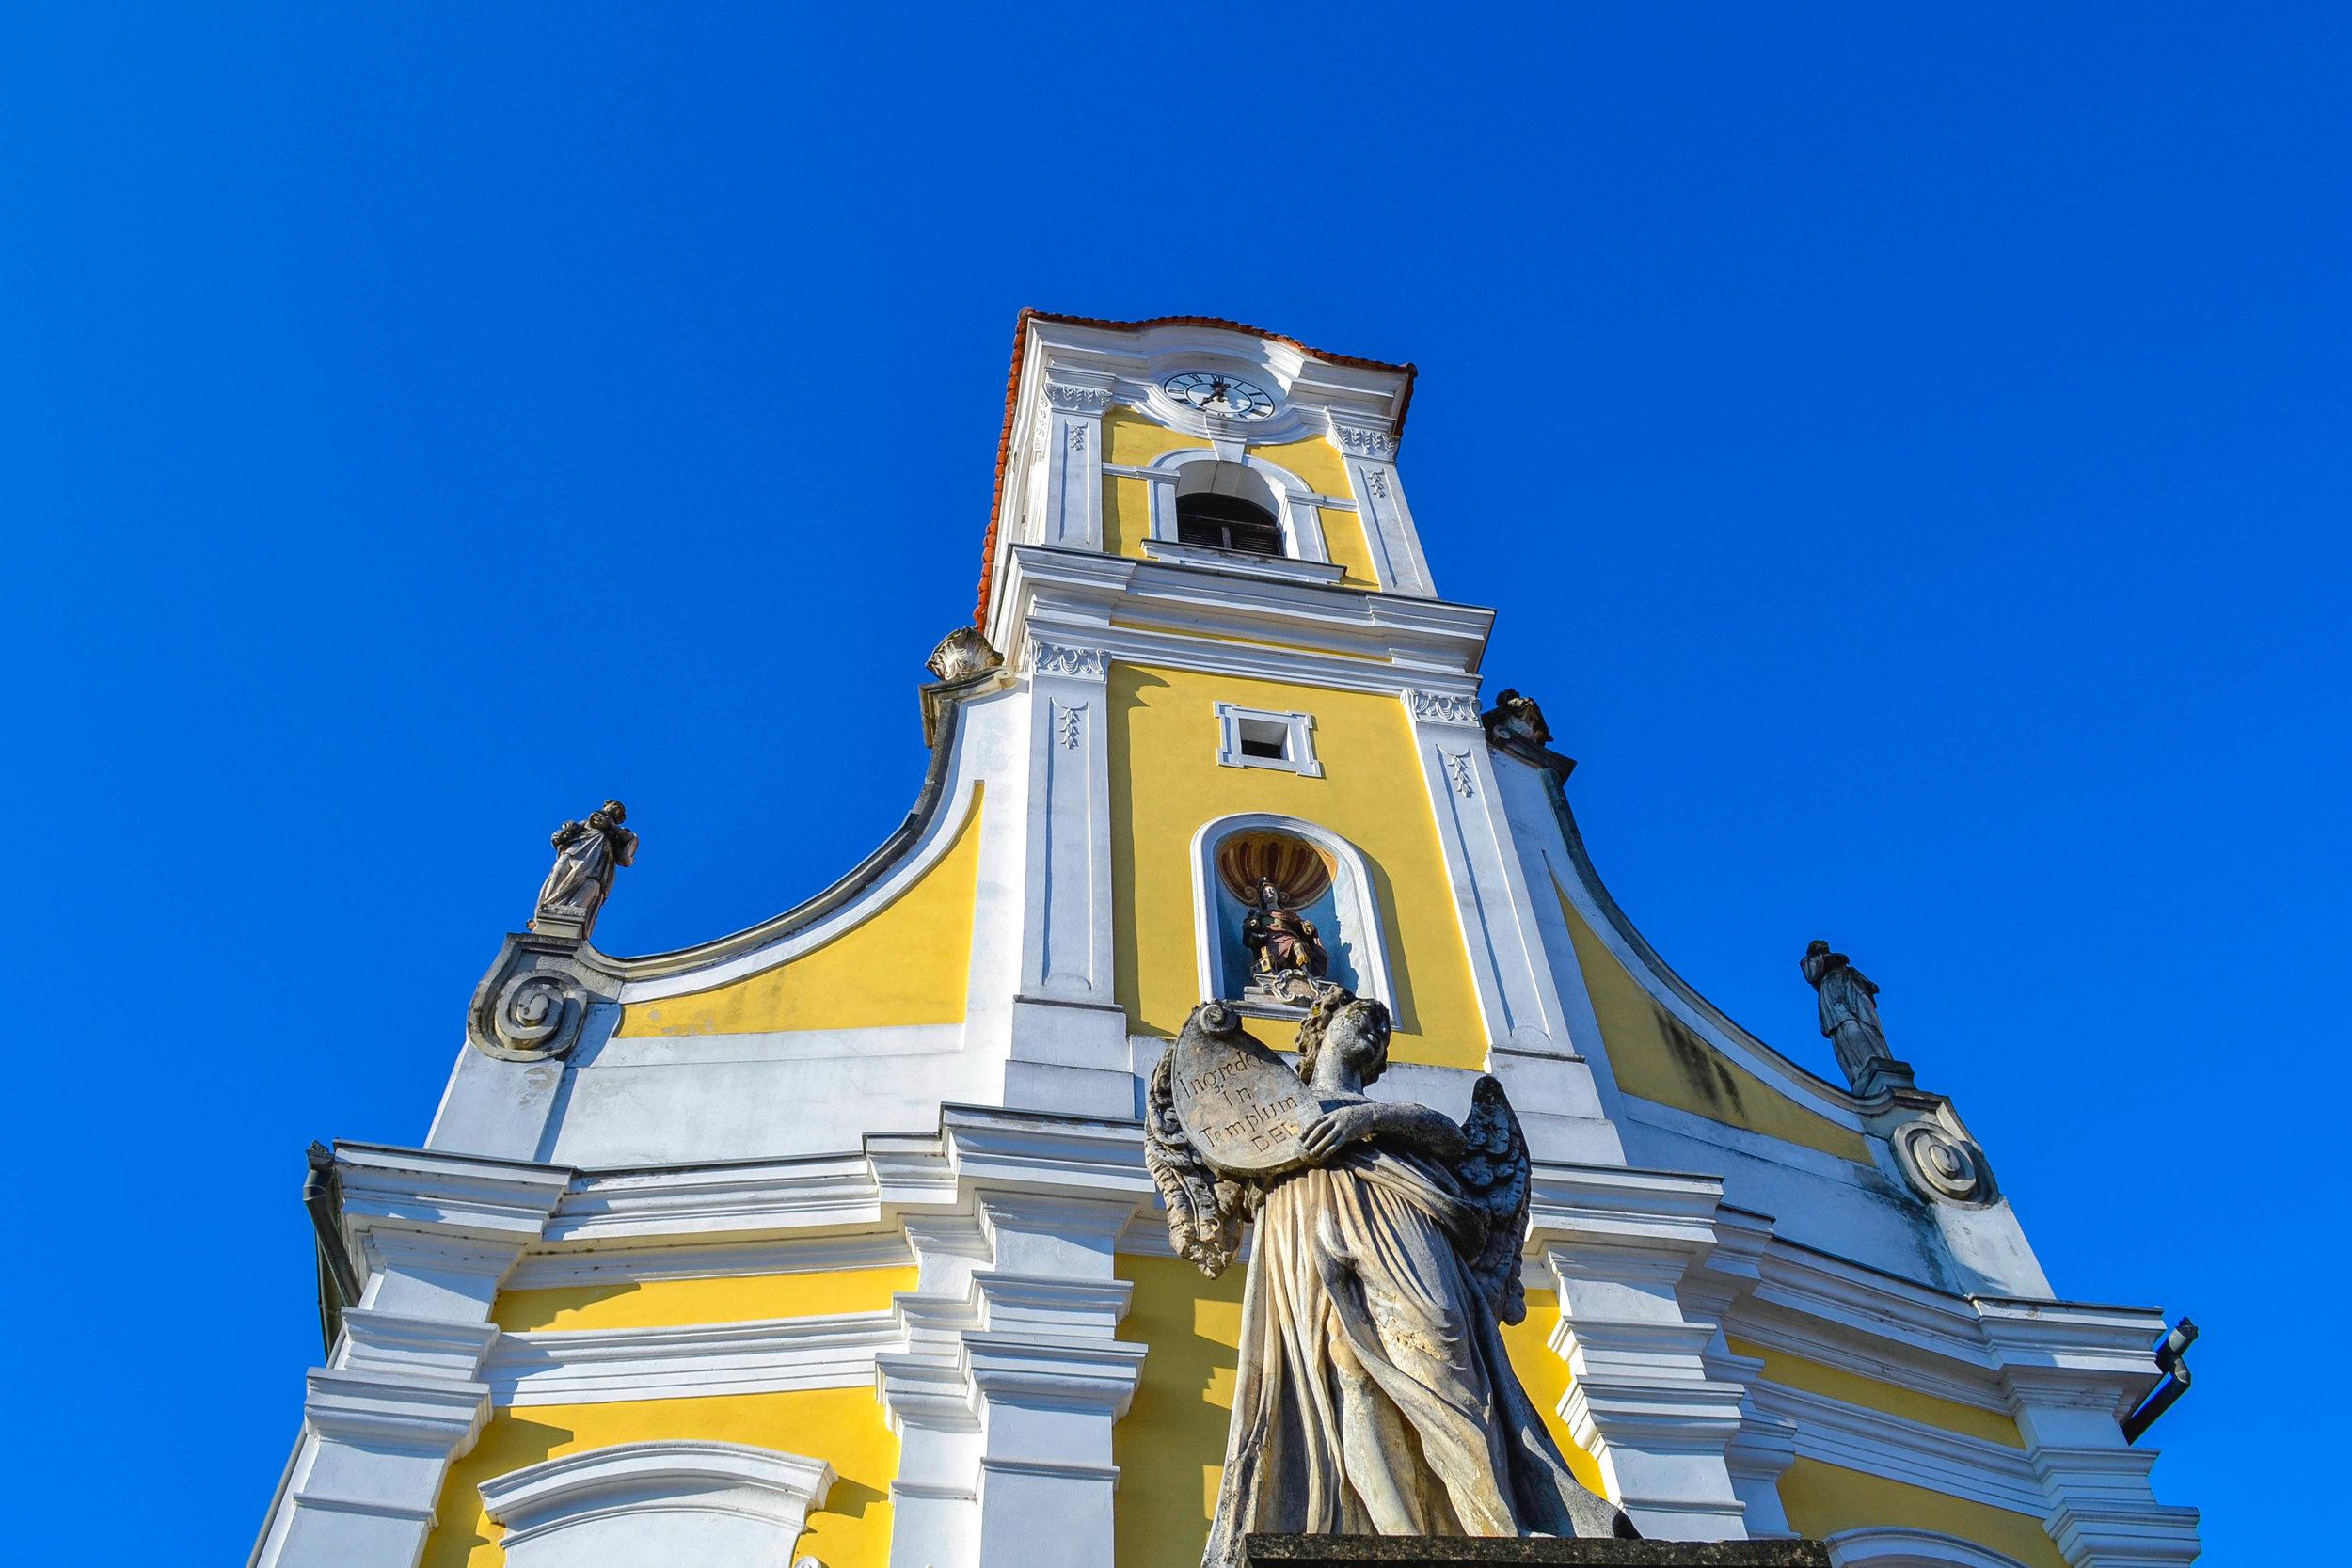 Church of St. Florian in Varazdin, Croatia